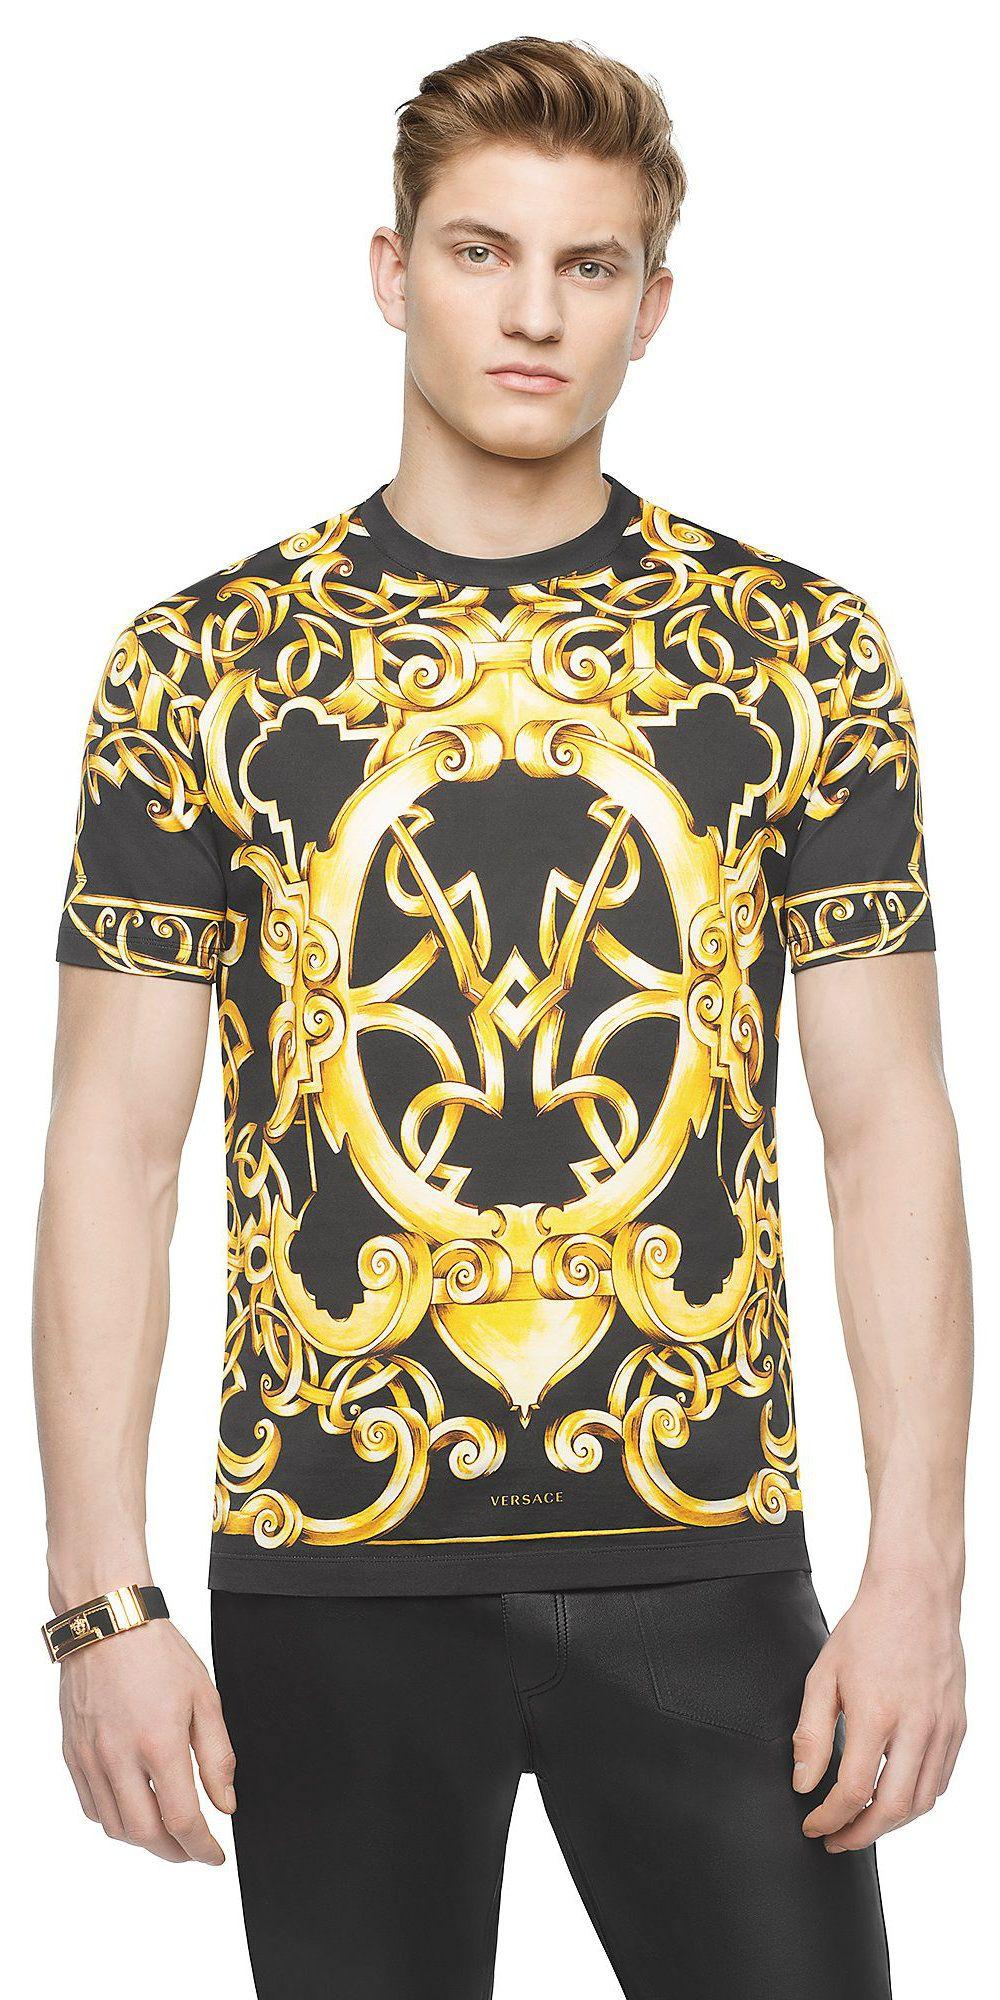 30571437603d Versace T-shirt coton Heritage Barocco 550 EUR.   Versace